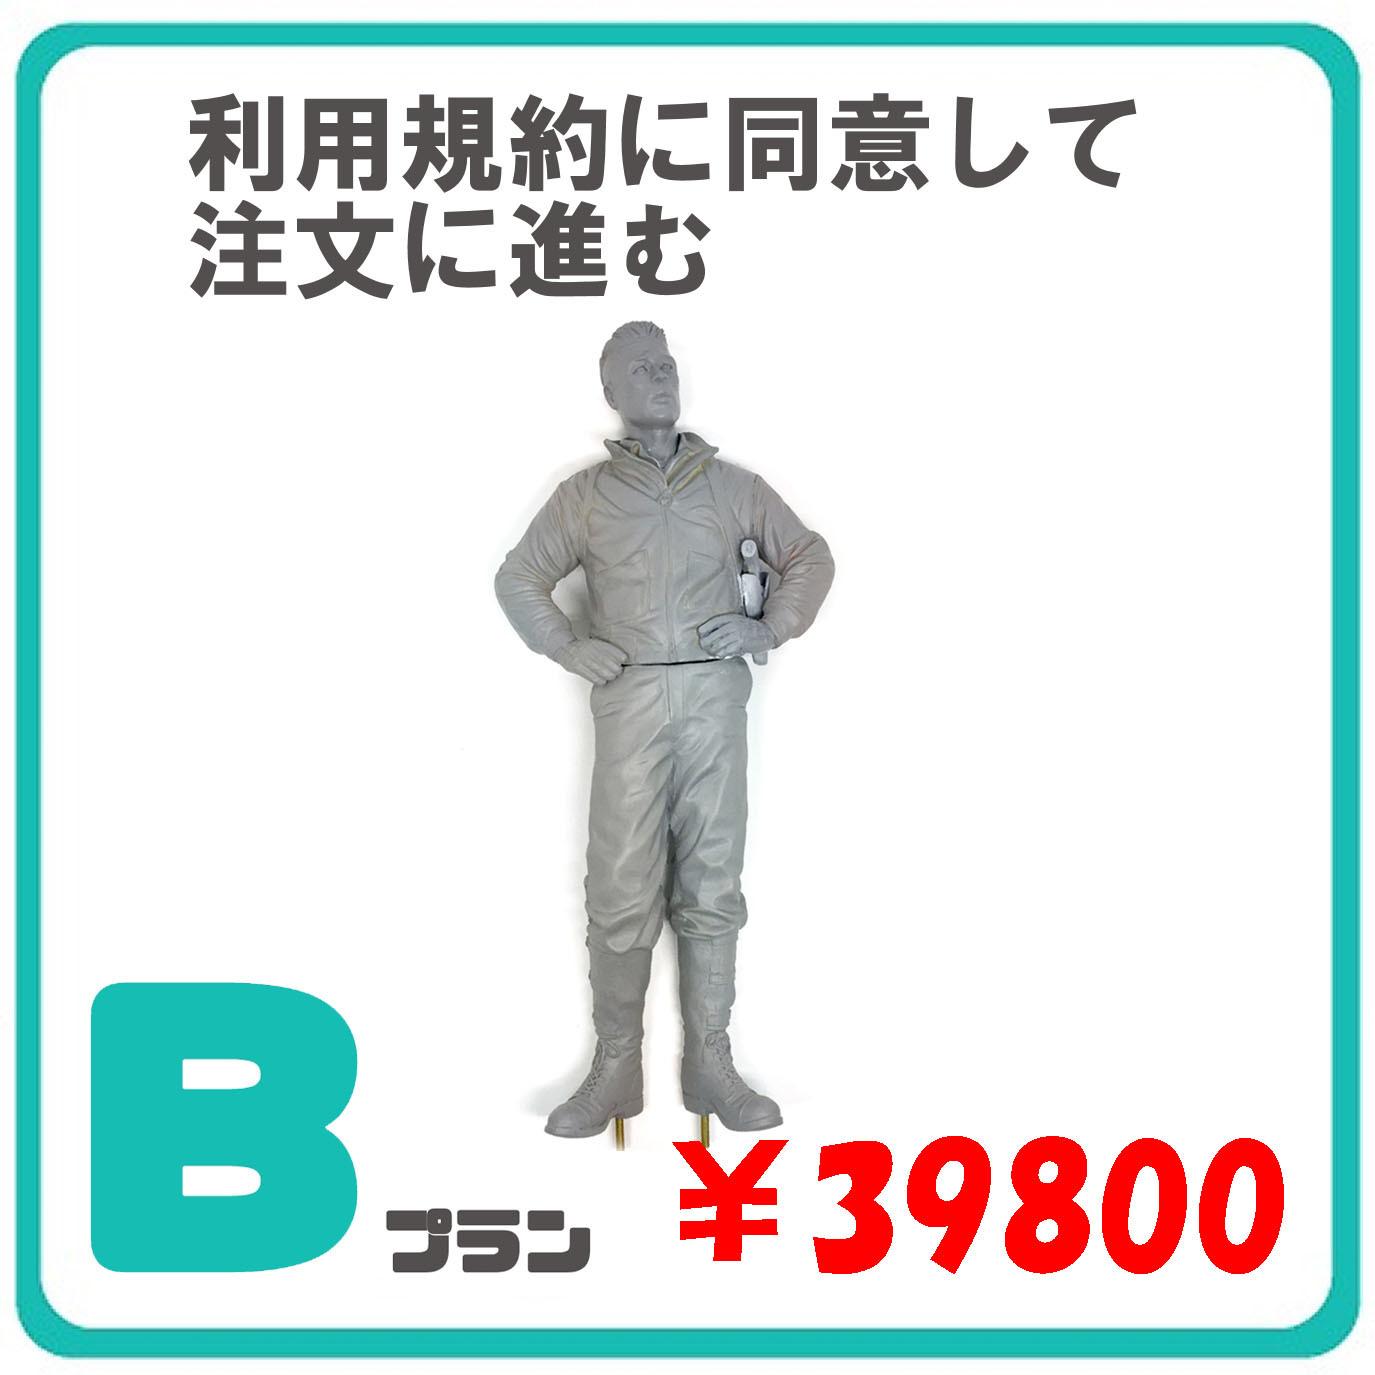 Bプラン:標準的原型